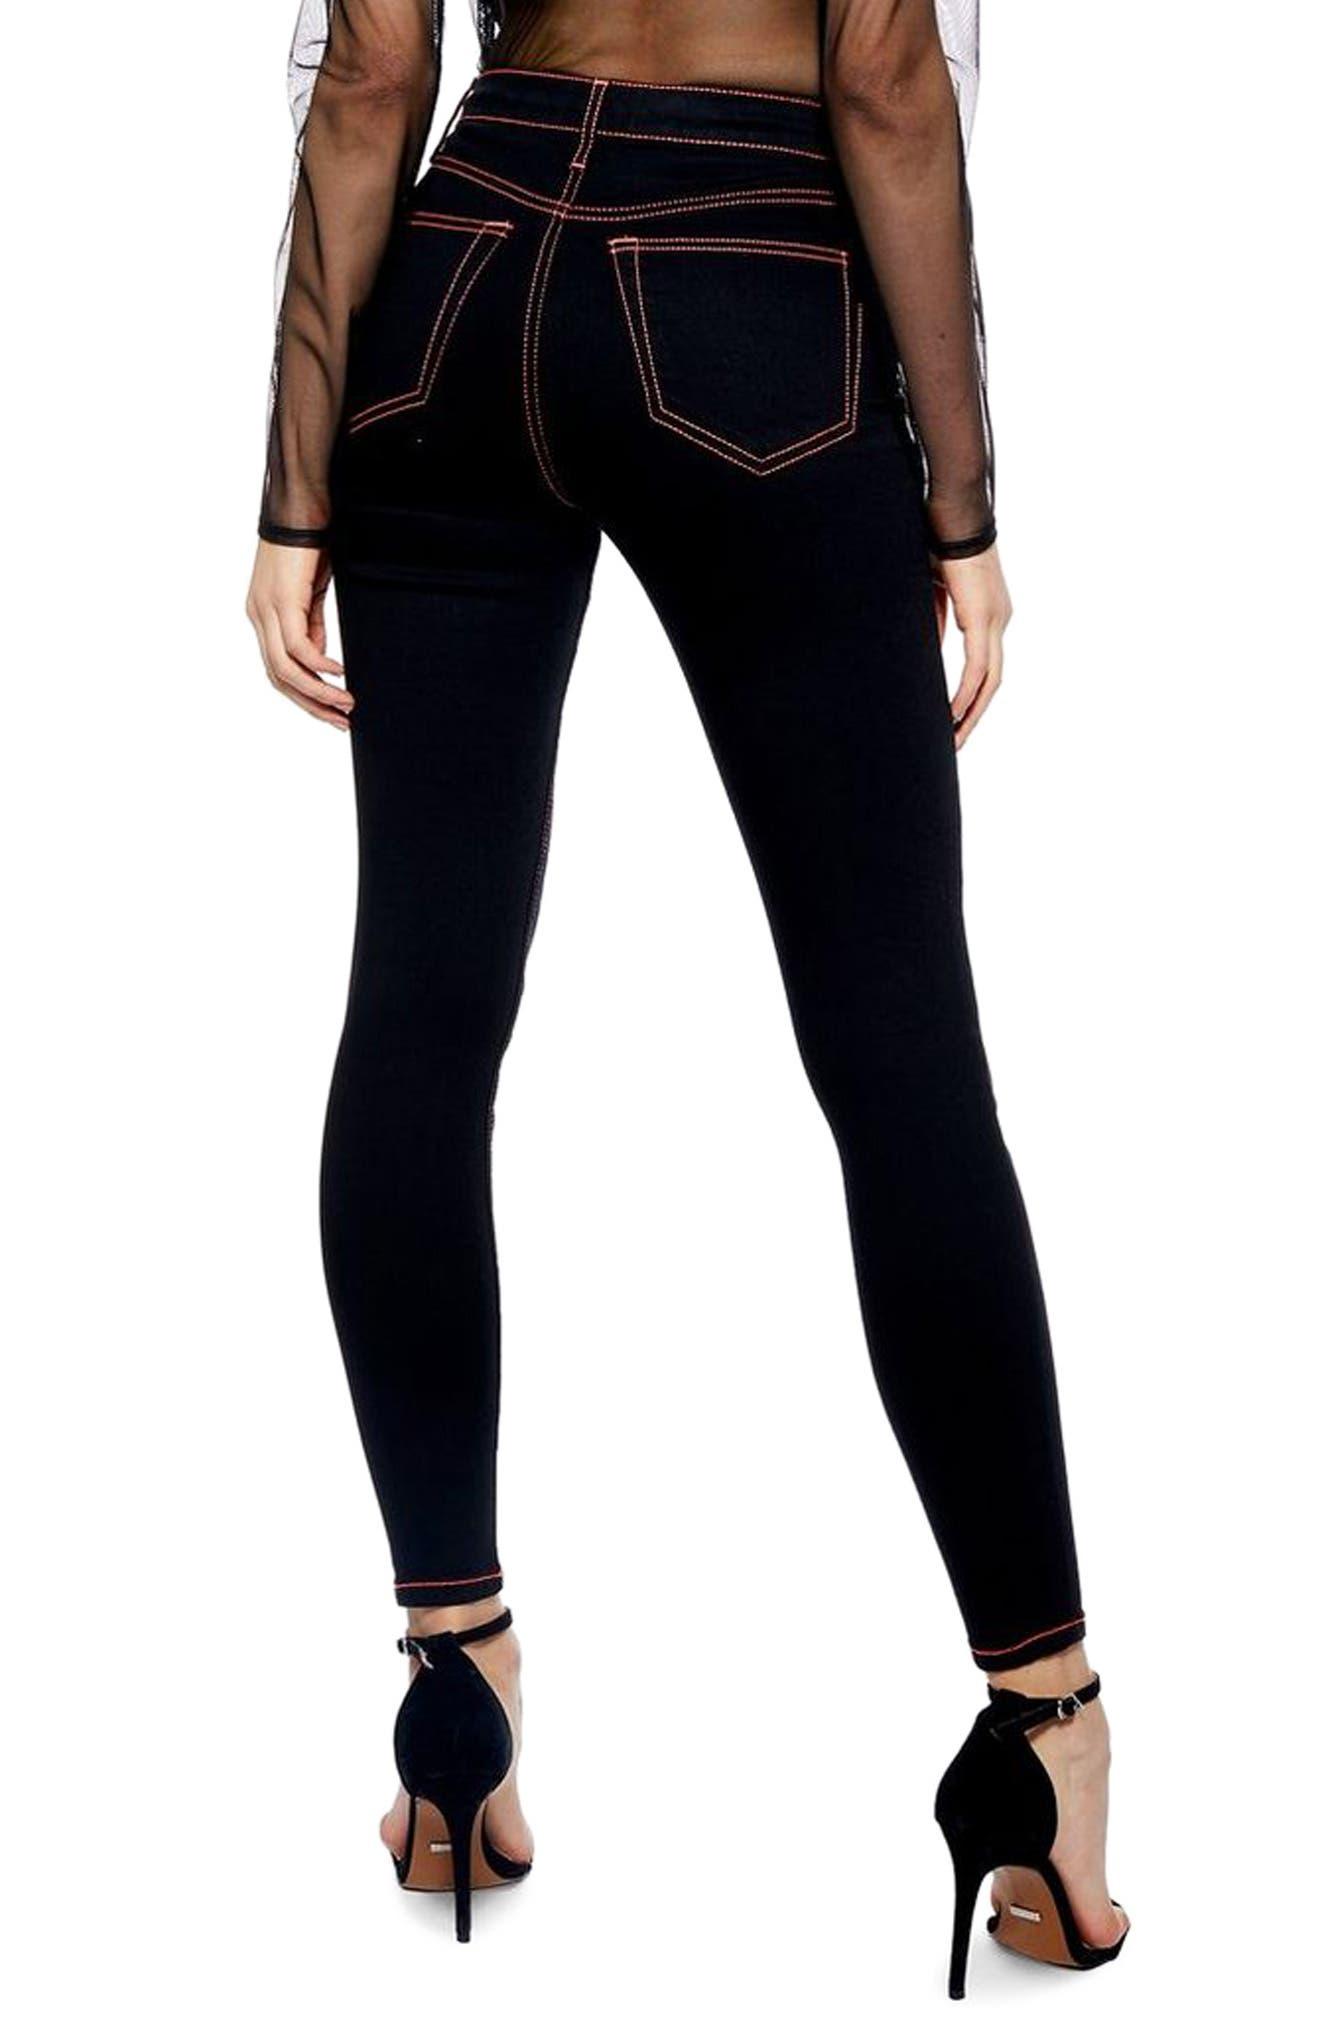 TOPSHOP, Jamie Neon Stitch High Waist Ankle Skinny Jeans, Alternate thumbnail 2, color, BLACK MULTI